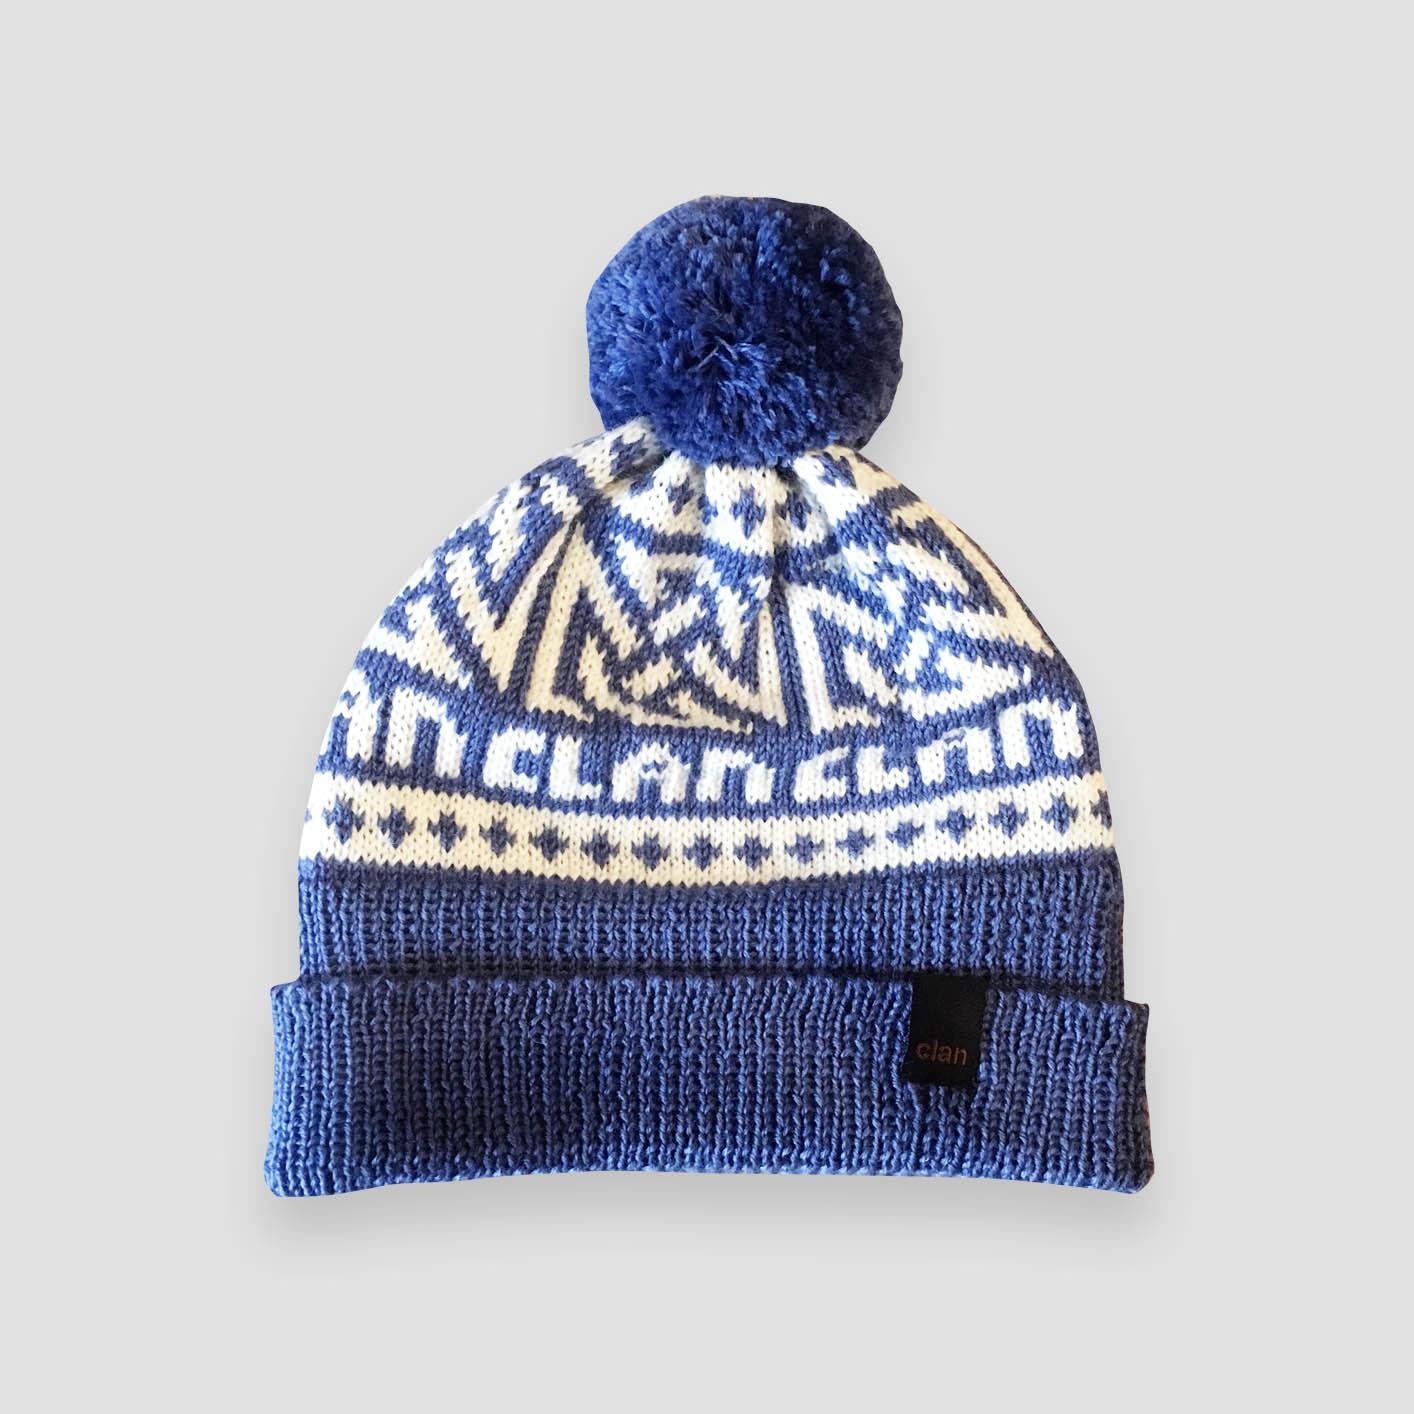 3bec04d4be949 Clan Merino Wool Light Blue Pompom Beanie